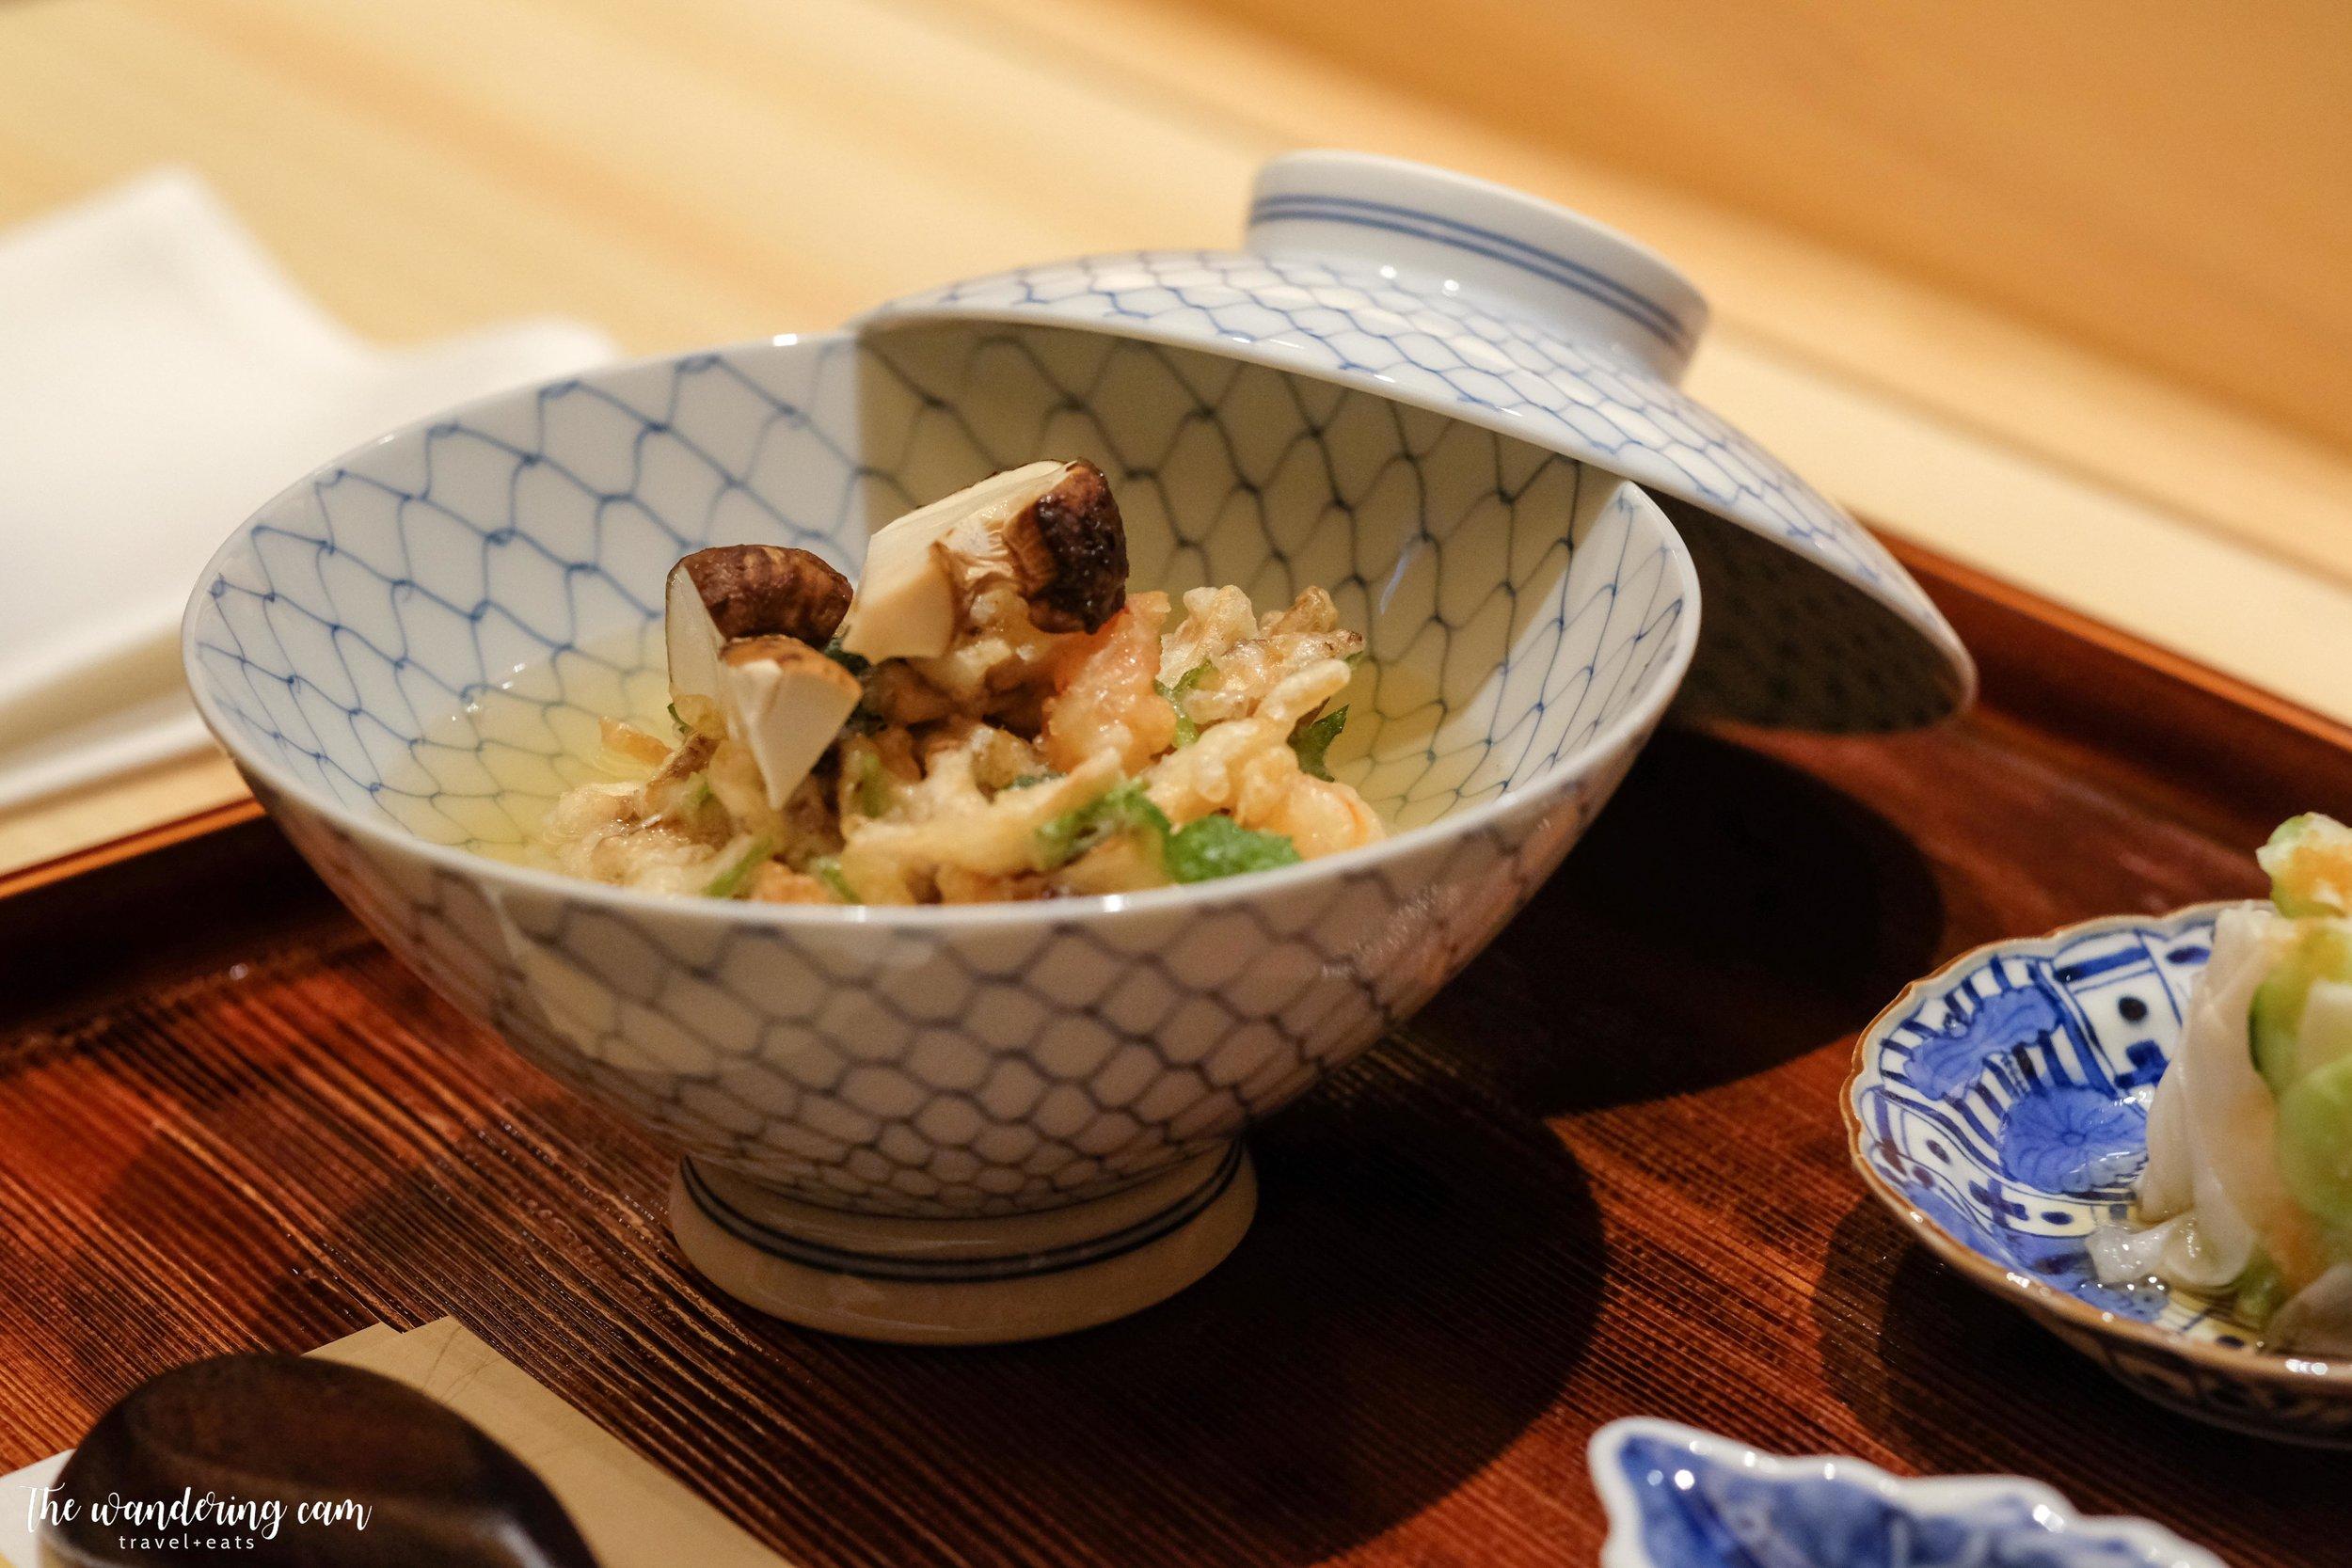 Ten-cha with matsutake broth